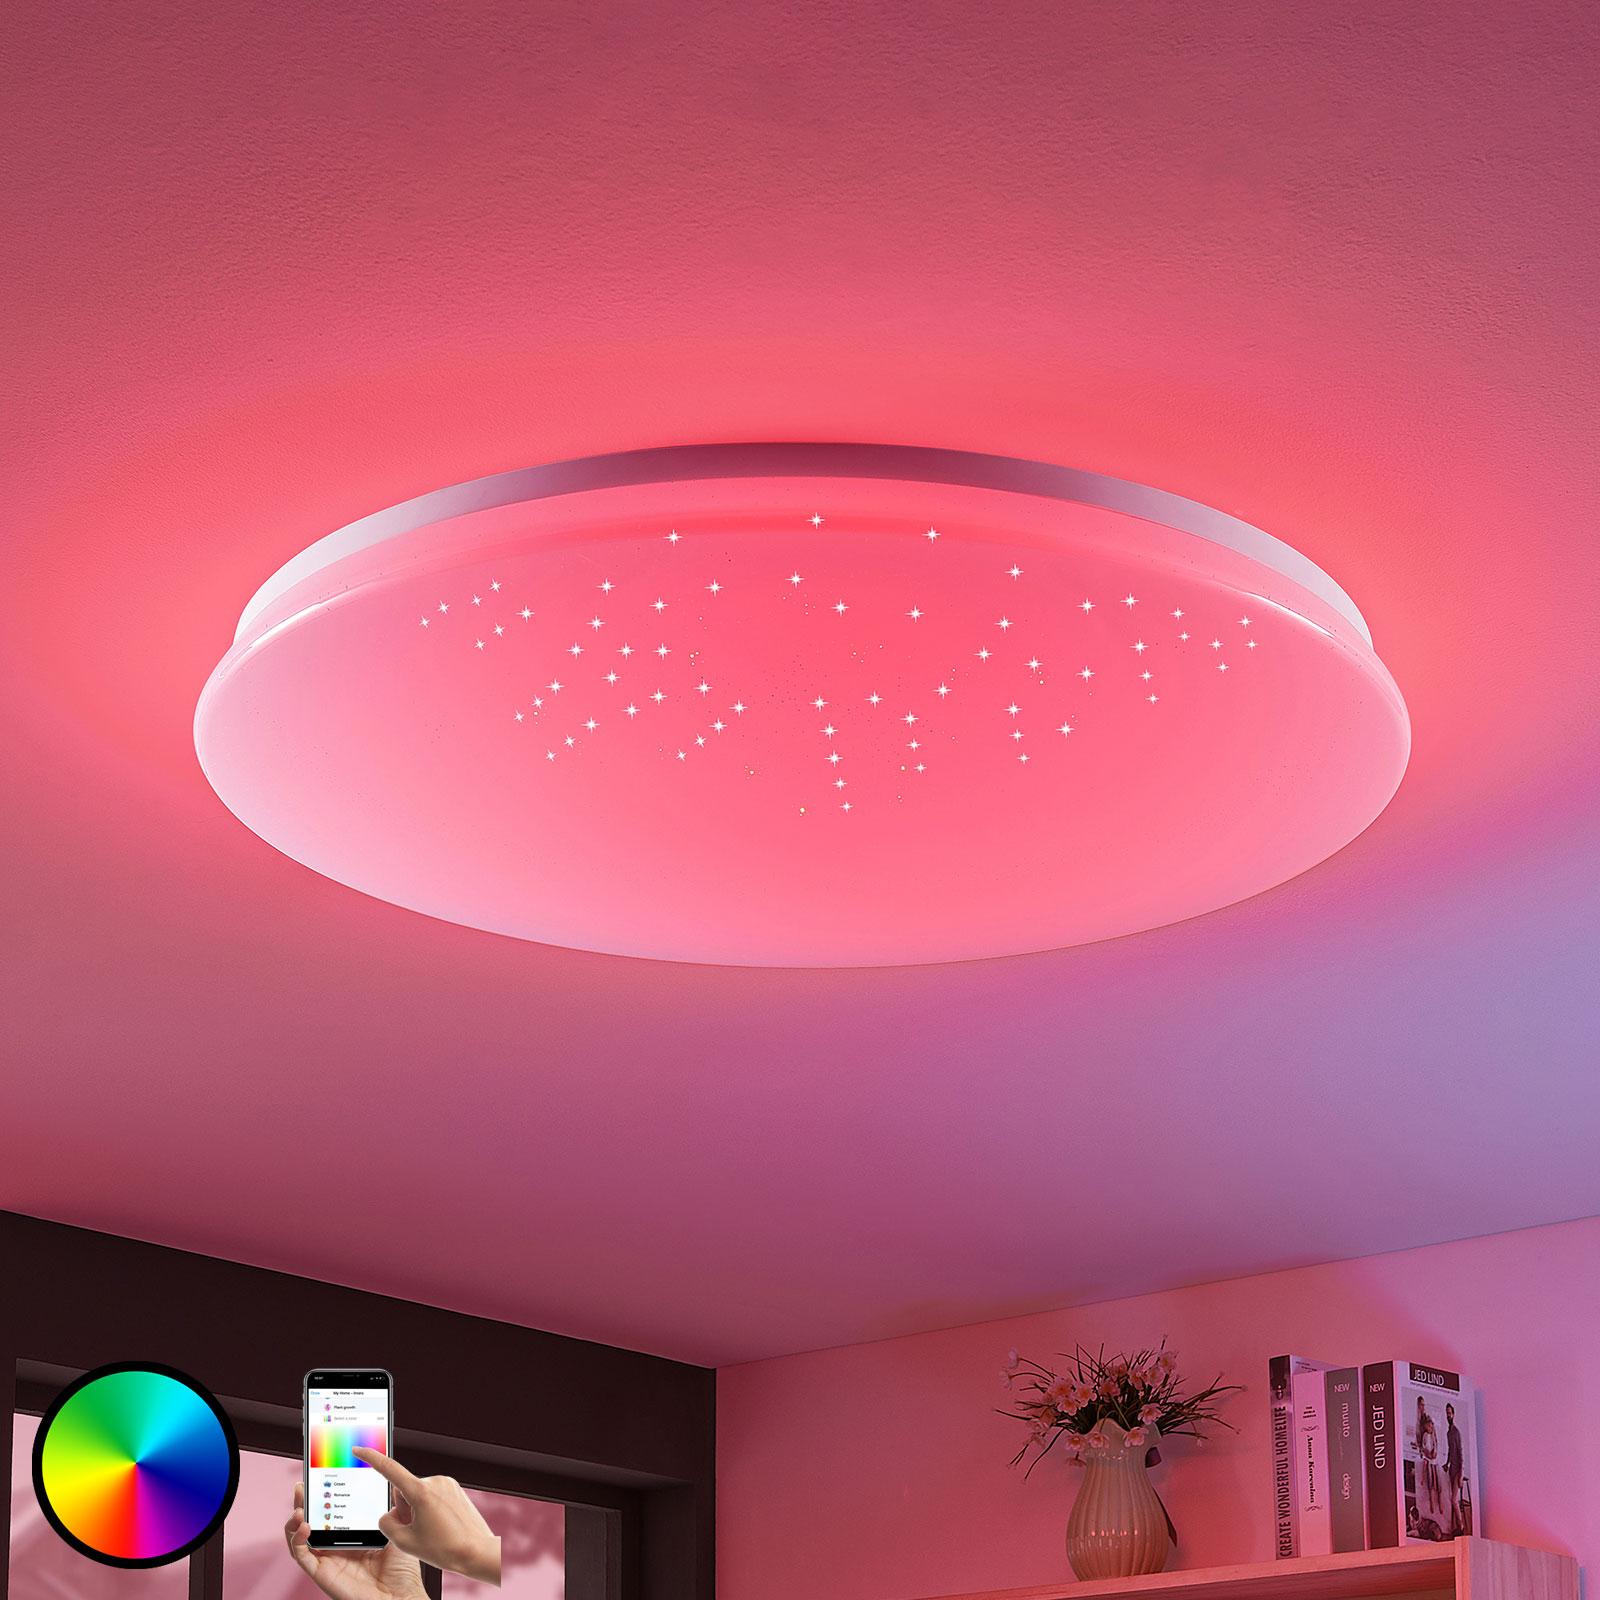 LED plafondlamp Marlie, WiZ-technologie, rond